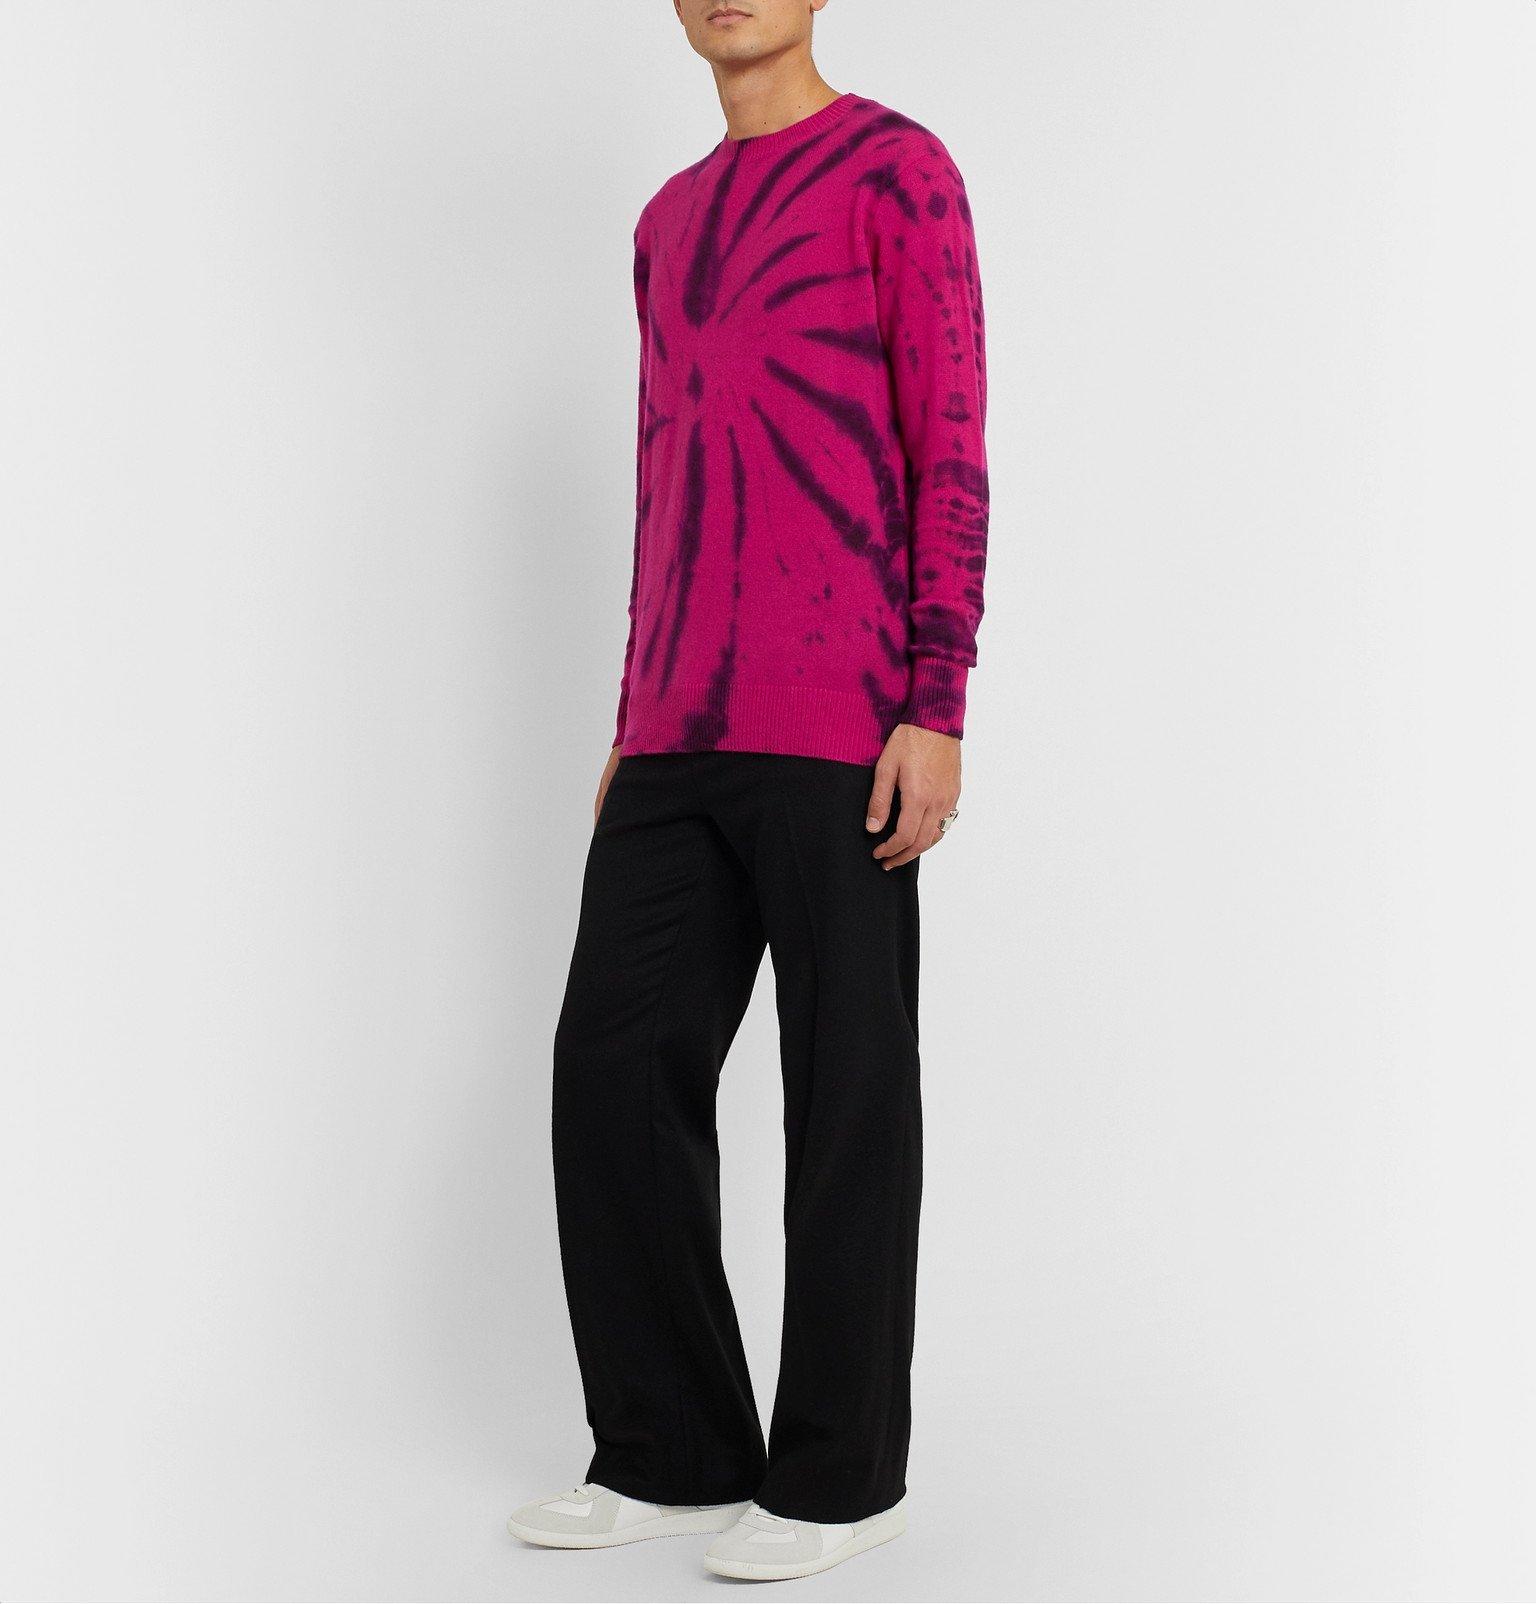 The Elder Statesman - Tie-Dyed Cashmere Sweater - Pink